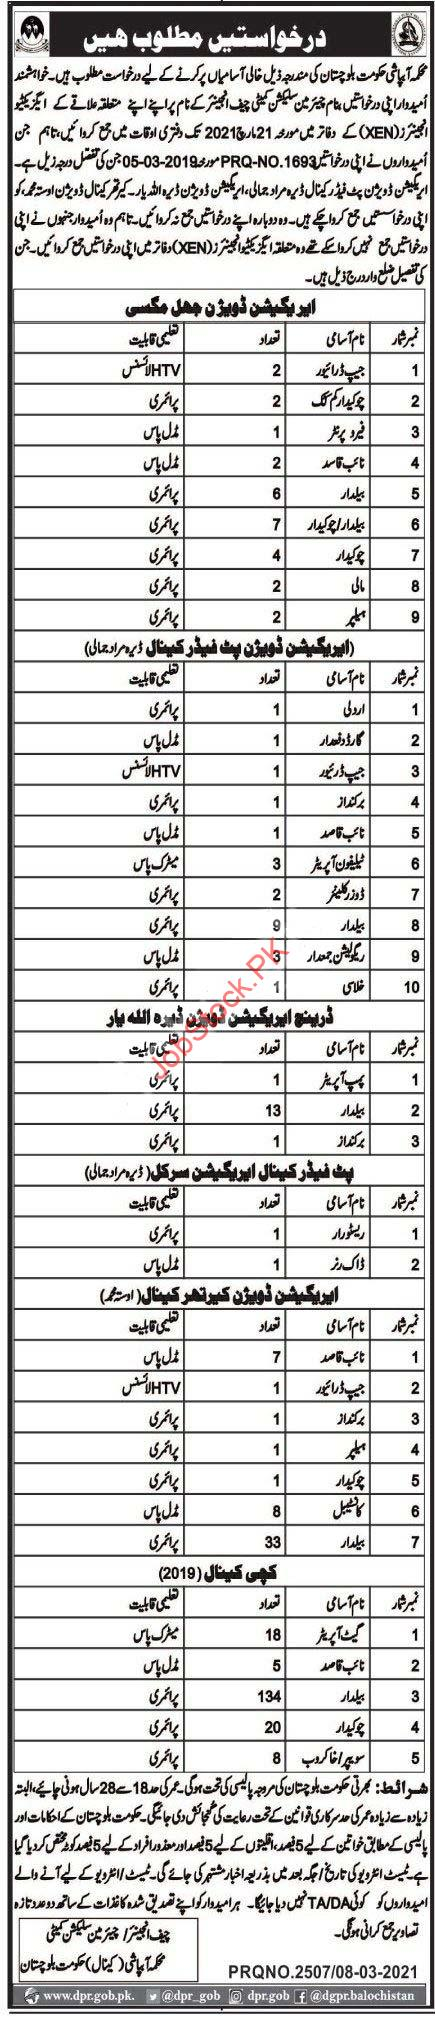 Irrigation Department Balochistan Jobs 2021 March Latest